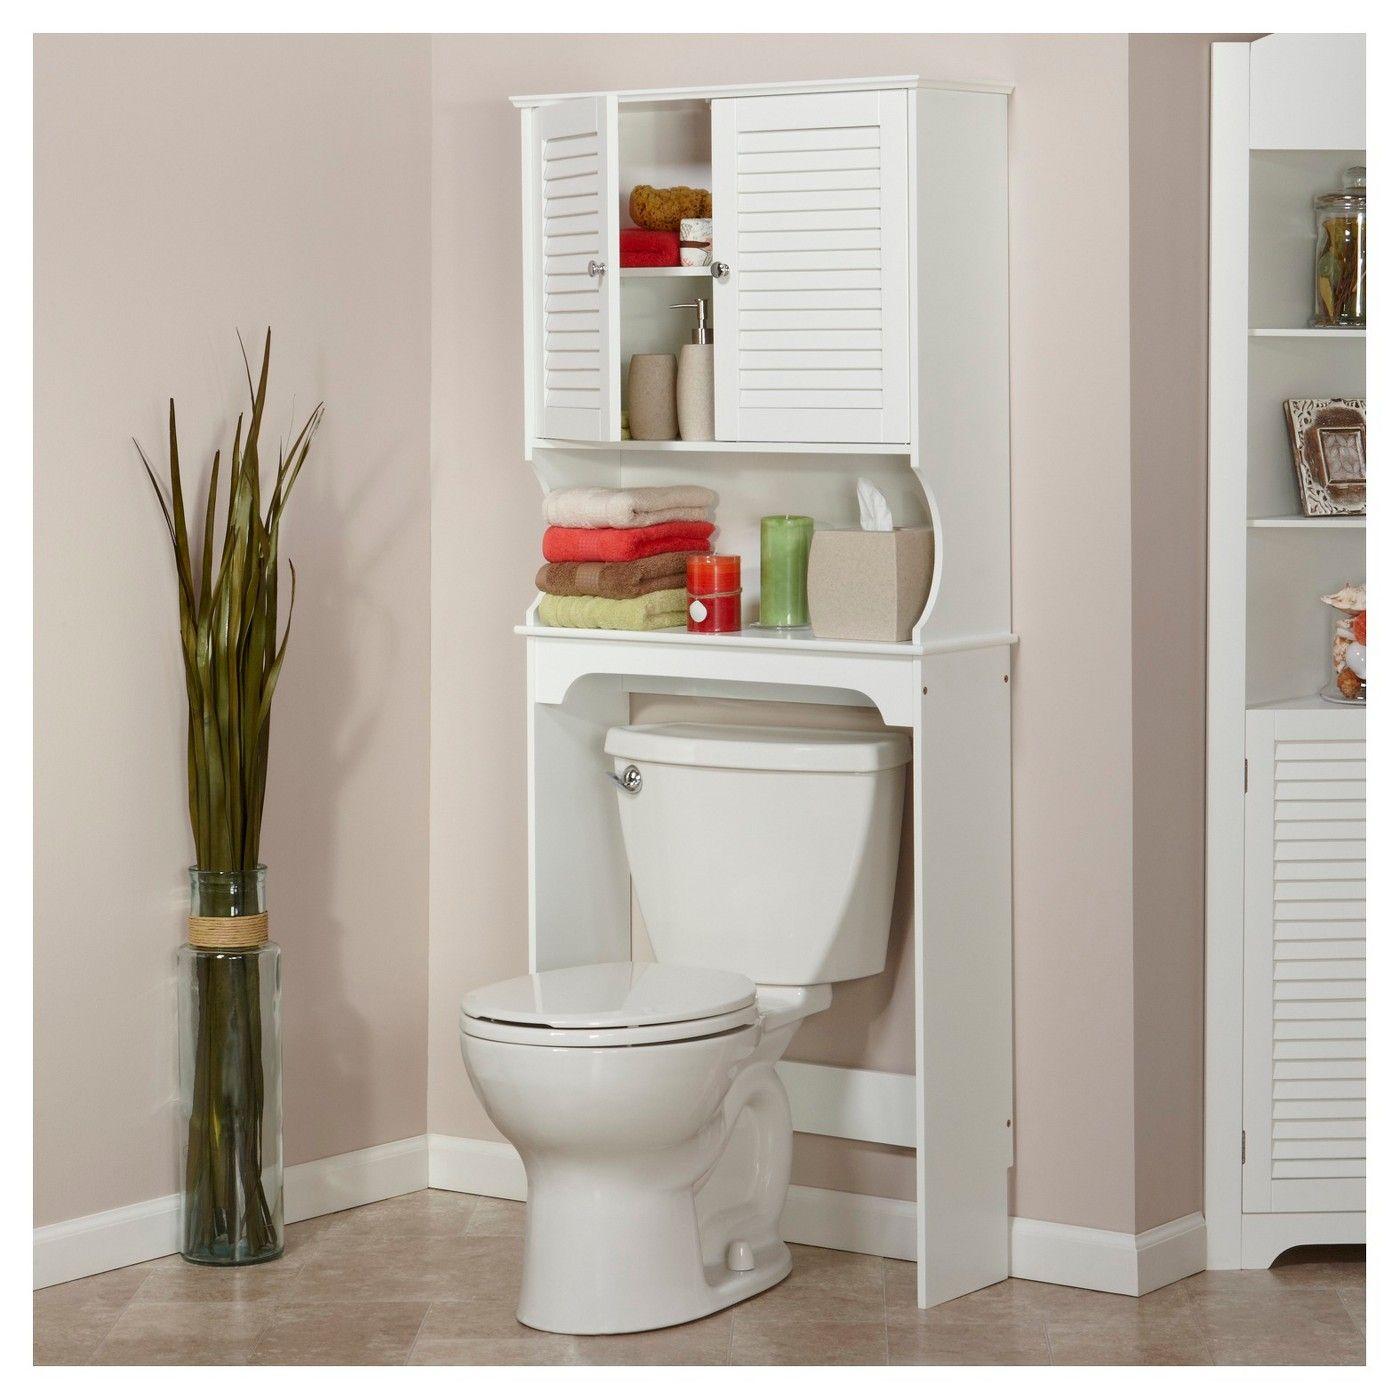 Ellsworth Space Saver Etagere White Espresso Riverridge Image 2 Of 3 Over The Toilet Cabinet Toilet Storage Bathroom Storage Cabinet